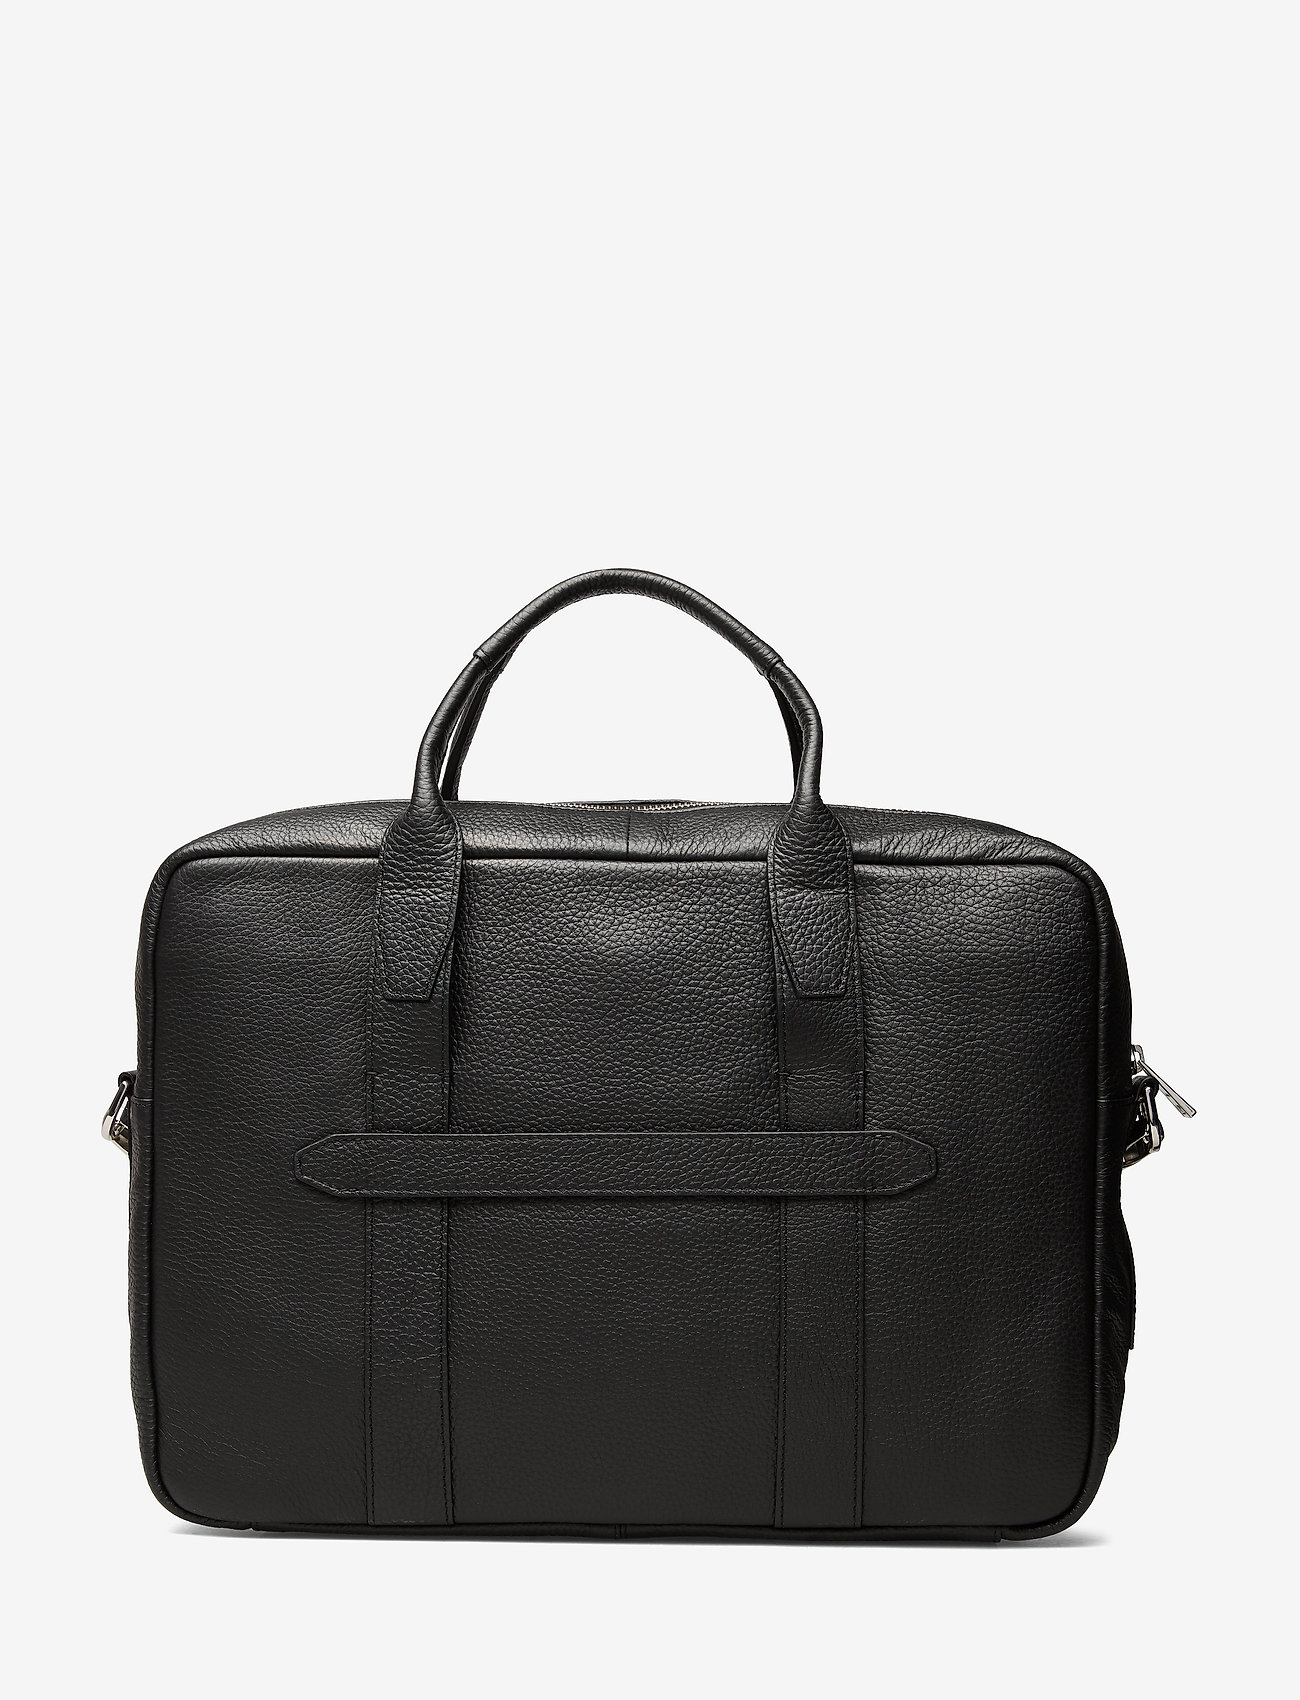 Royal Republiq Seeker Day Bag - Bags